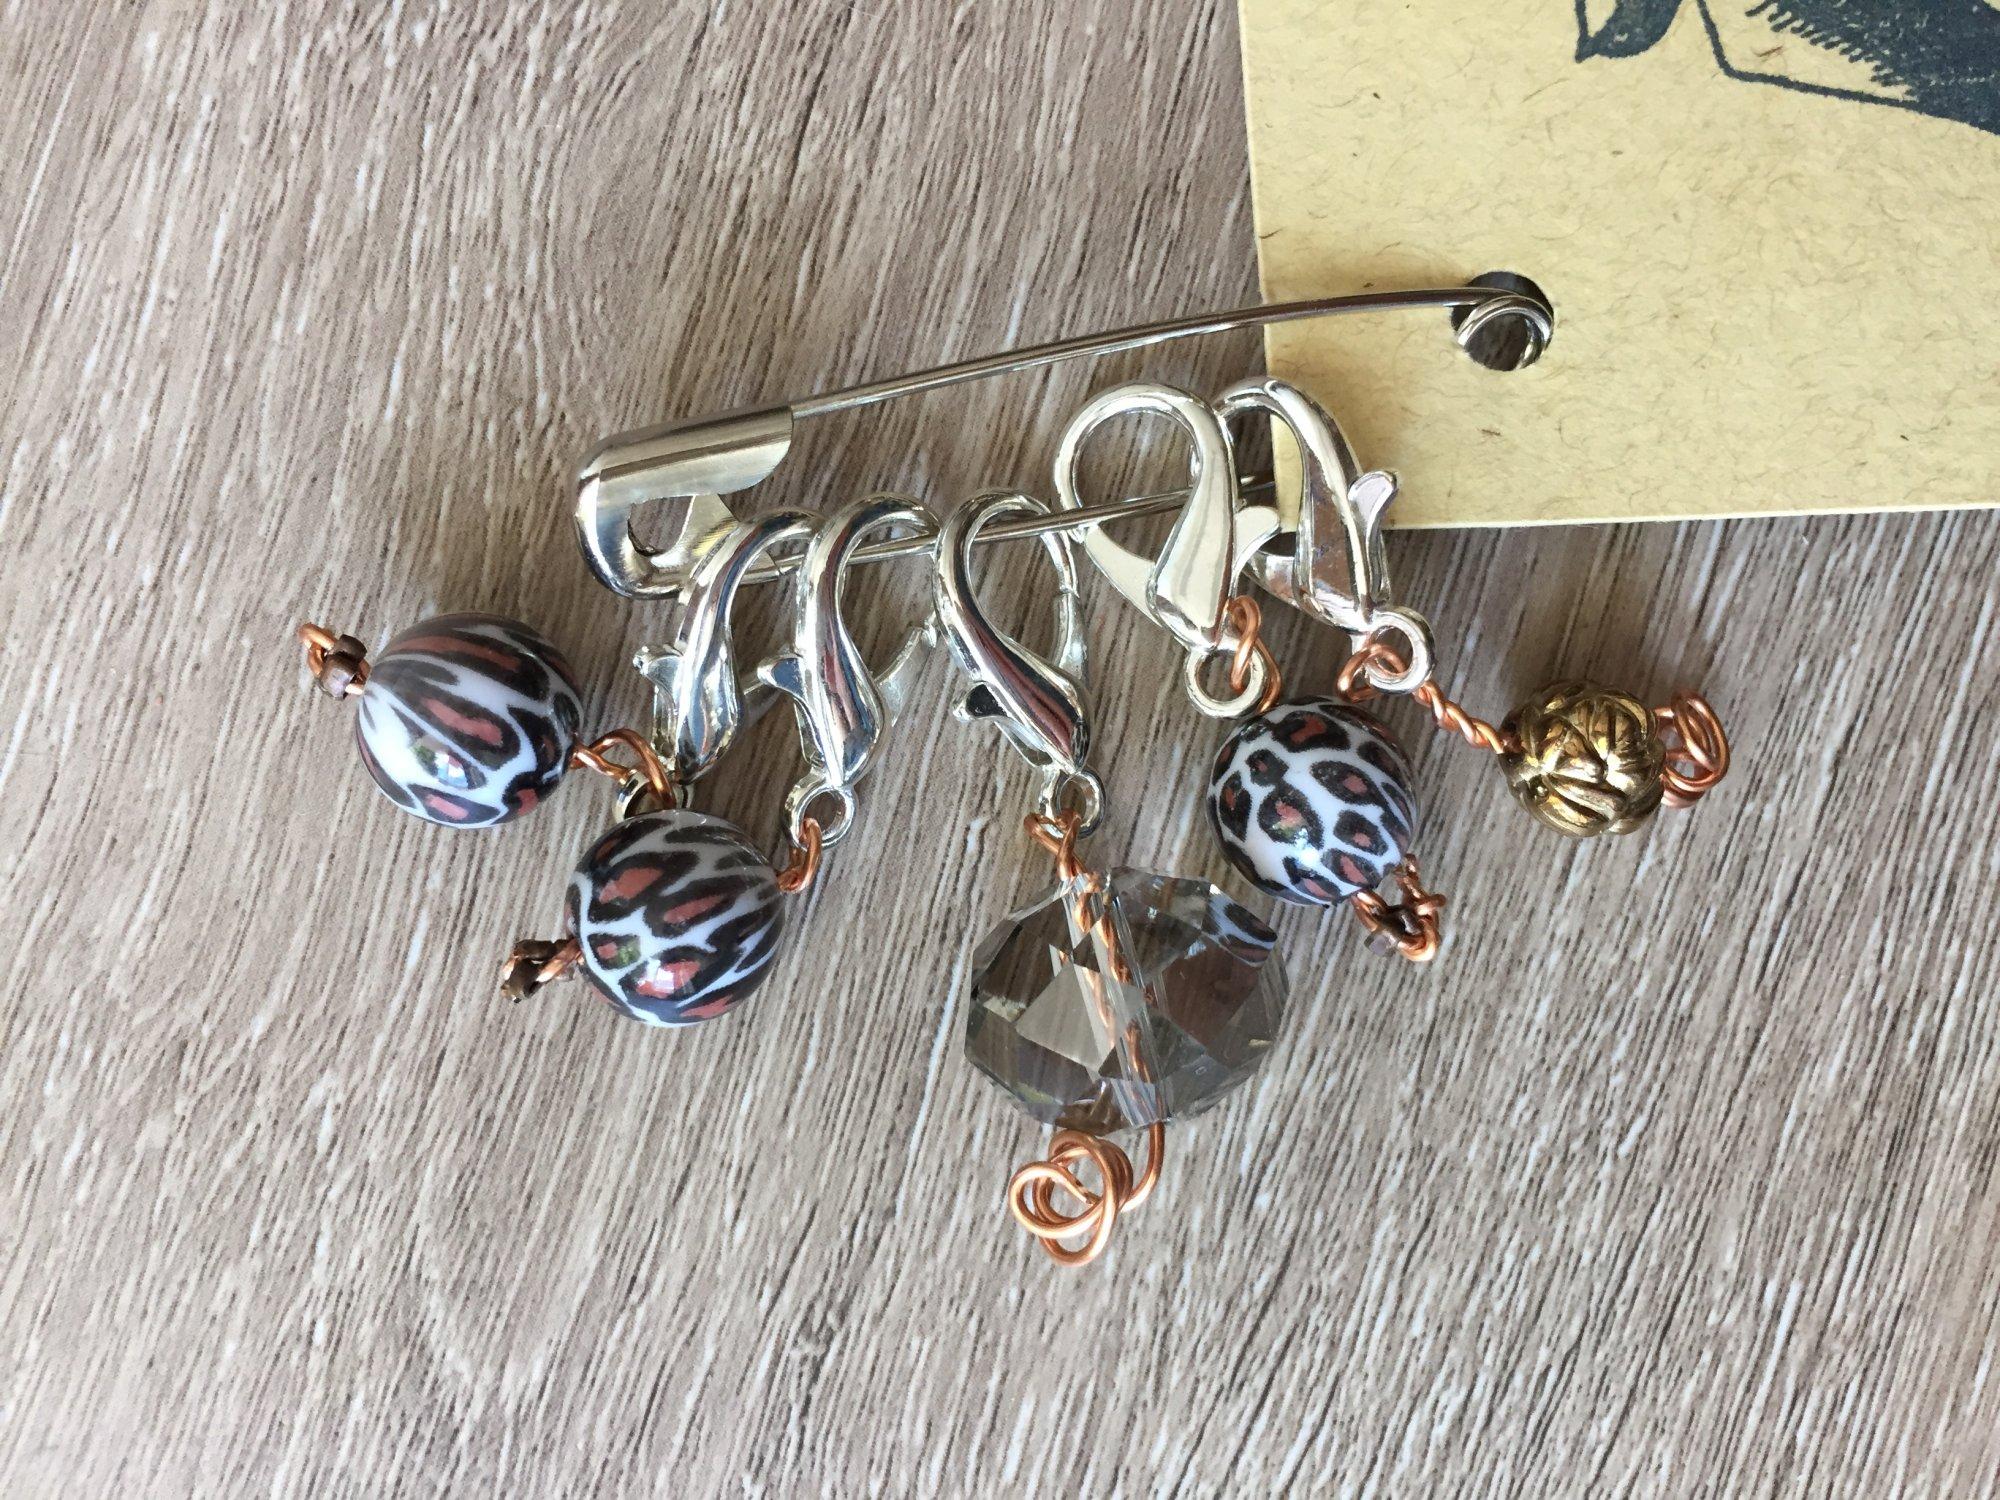 Leopard Print Stitch Markers - handmade knitting accessory